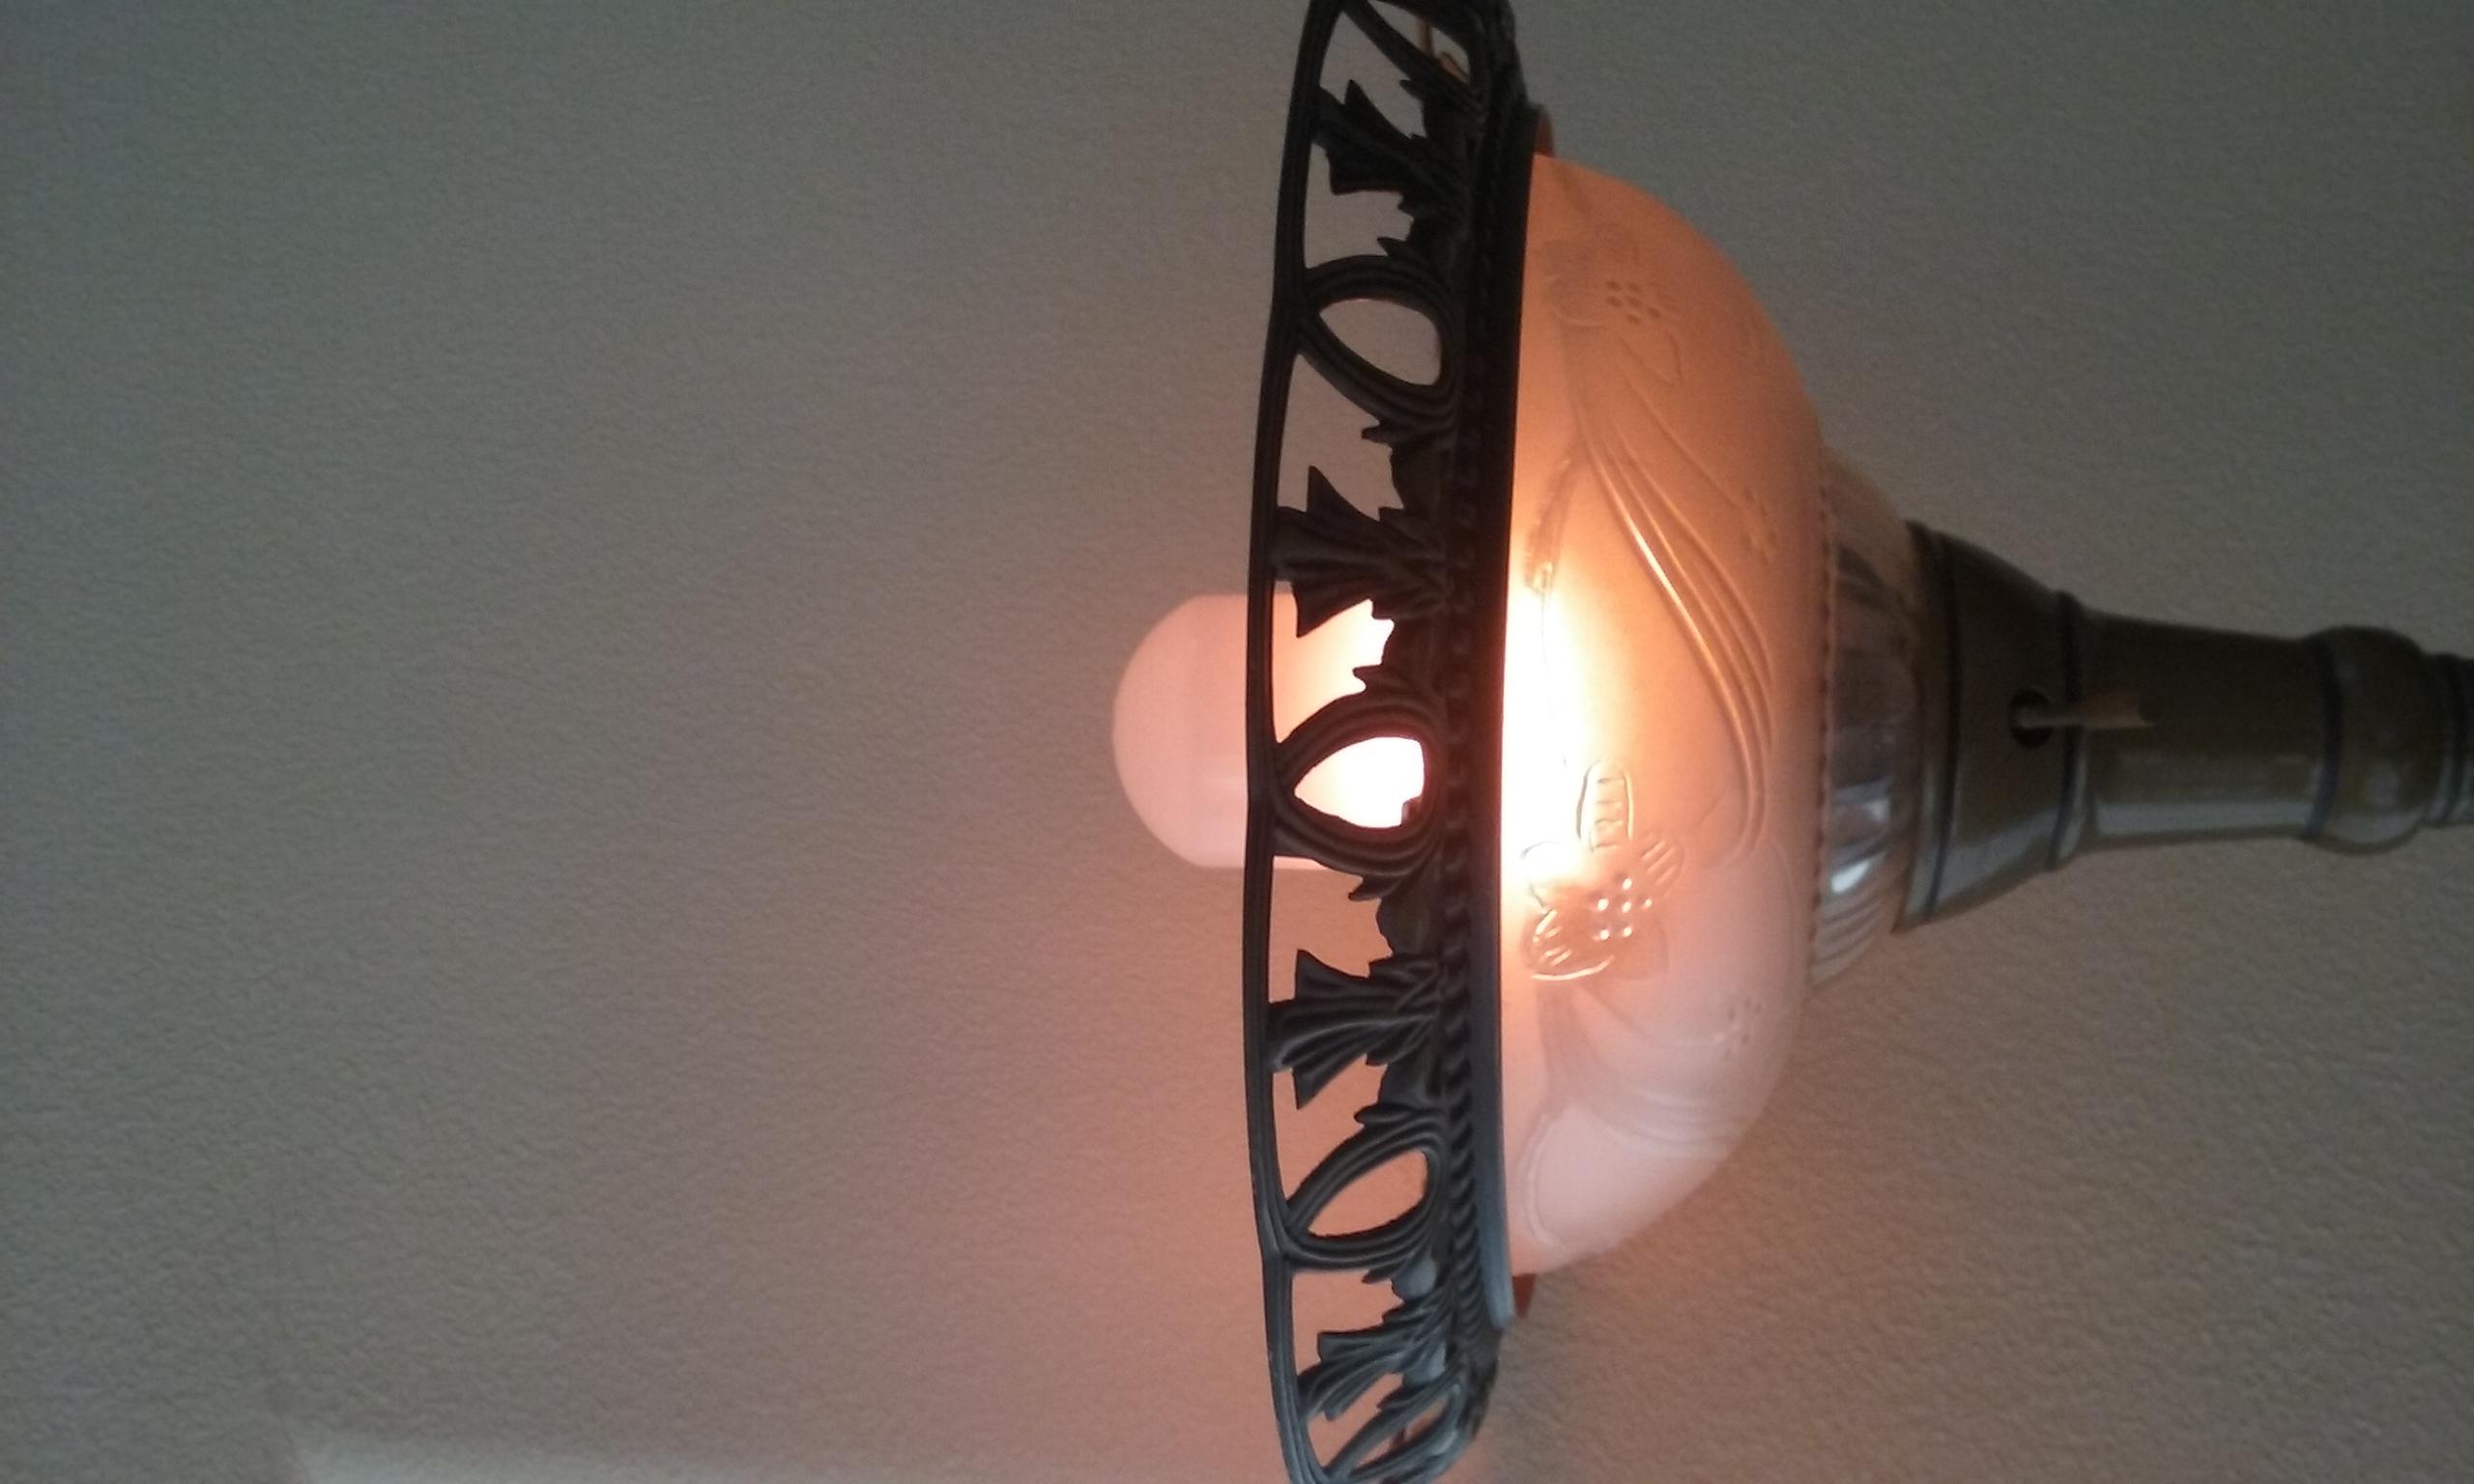 ROMANTIC FLAME-EFFECT LIGHT BULB